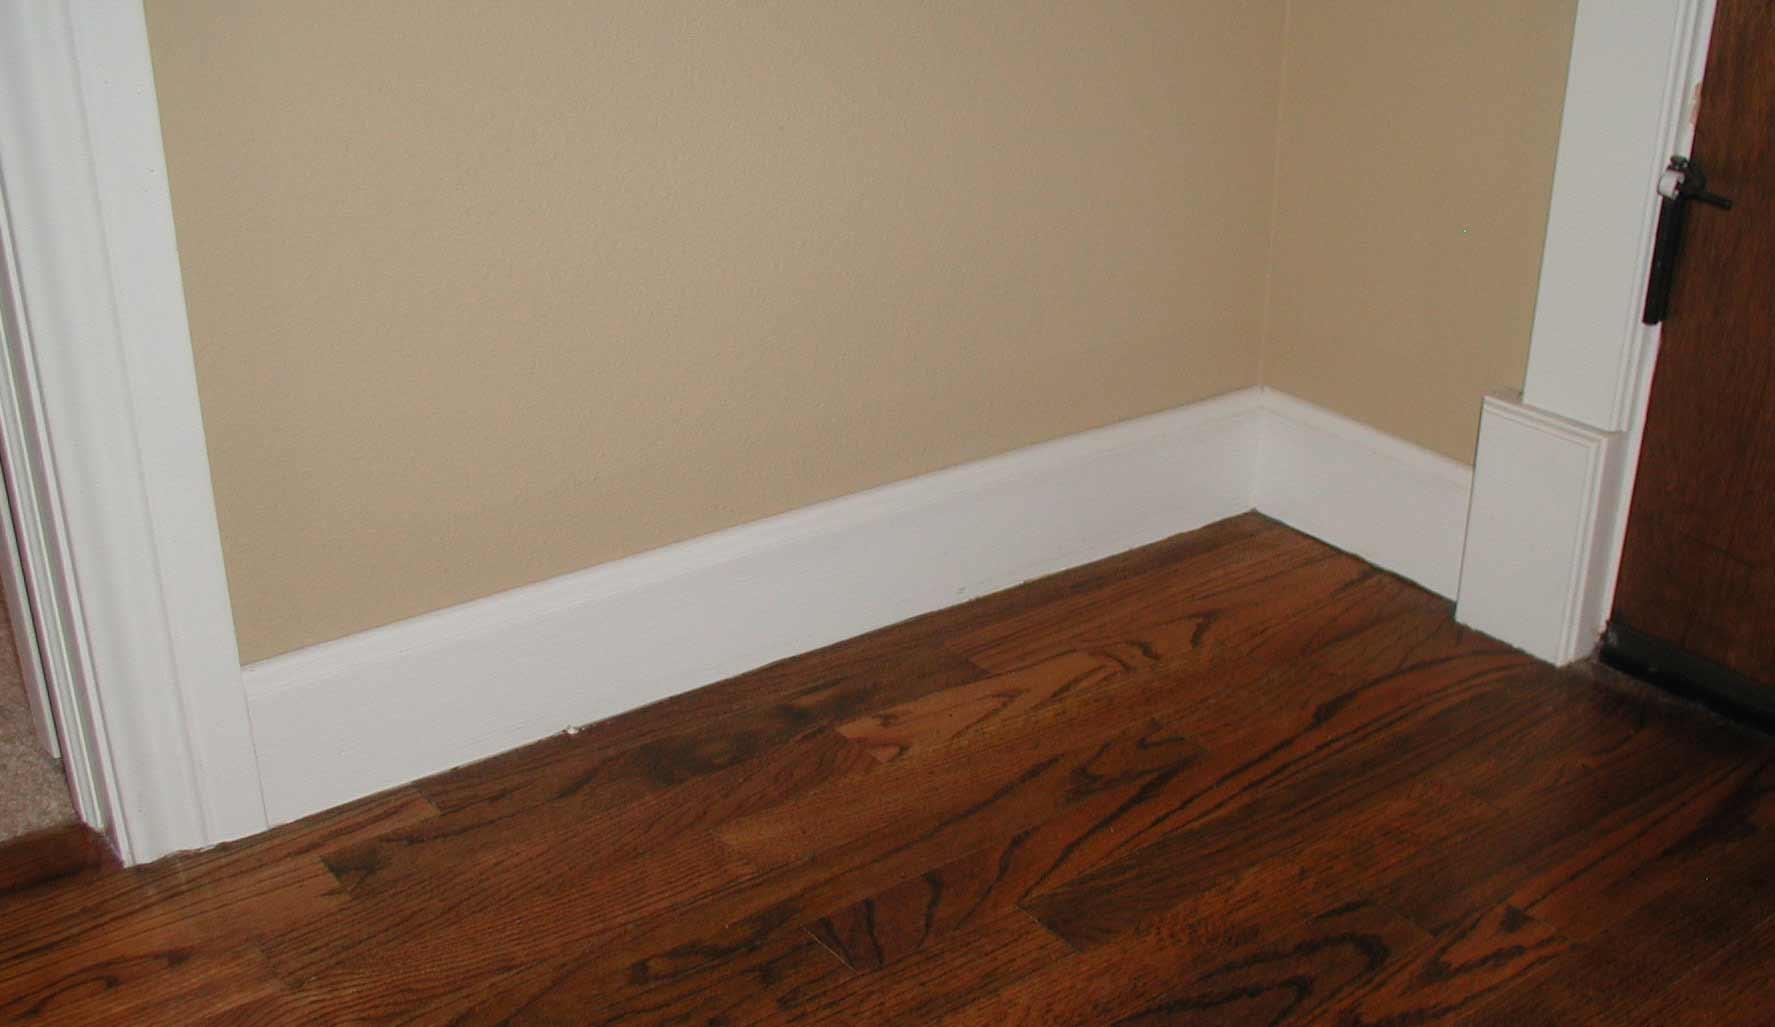 plastered corners baseboard rounded molding